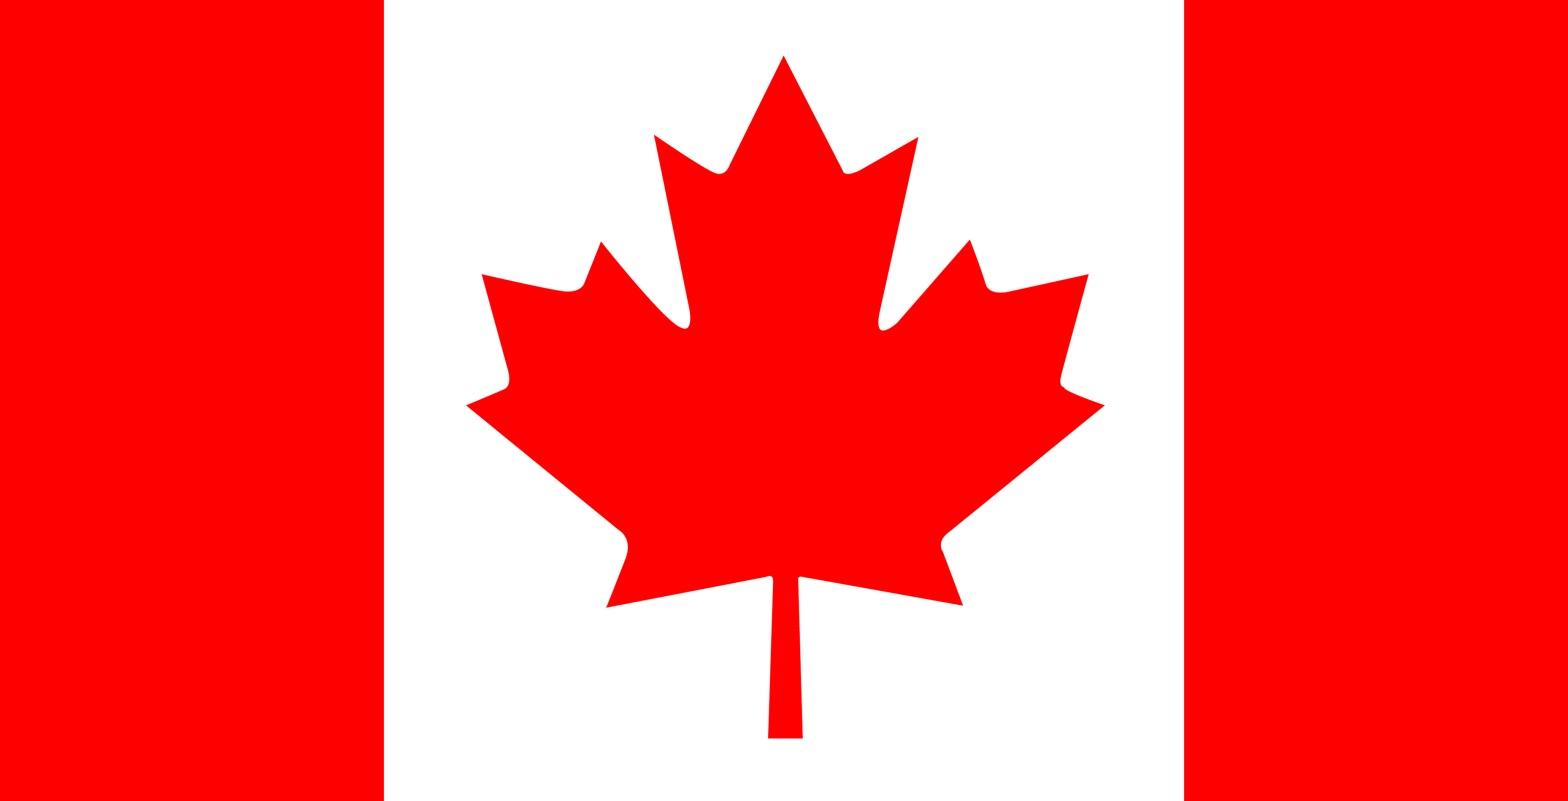 Chris Conner, Rick Slater, Canada Franchise Consultants